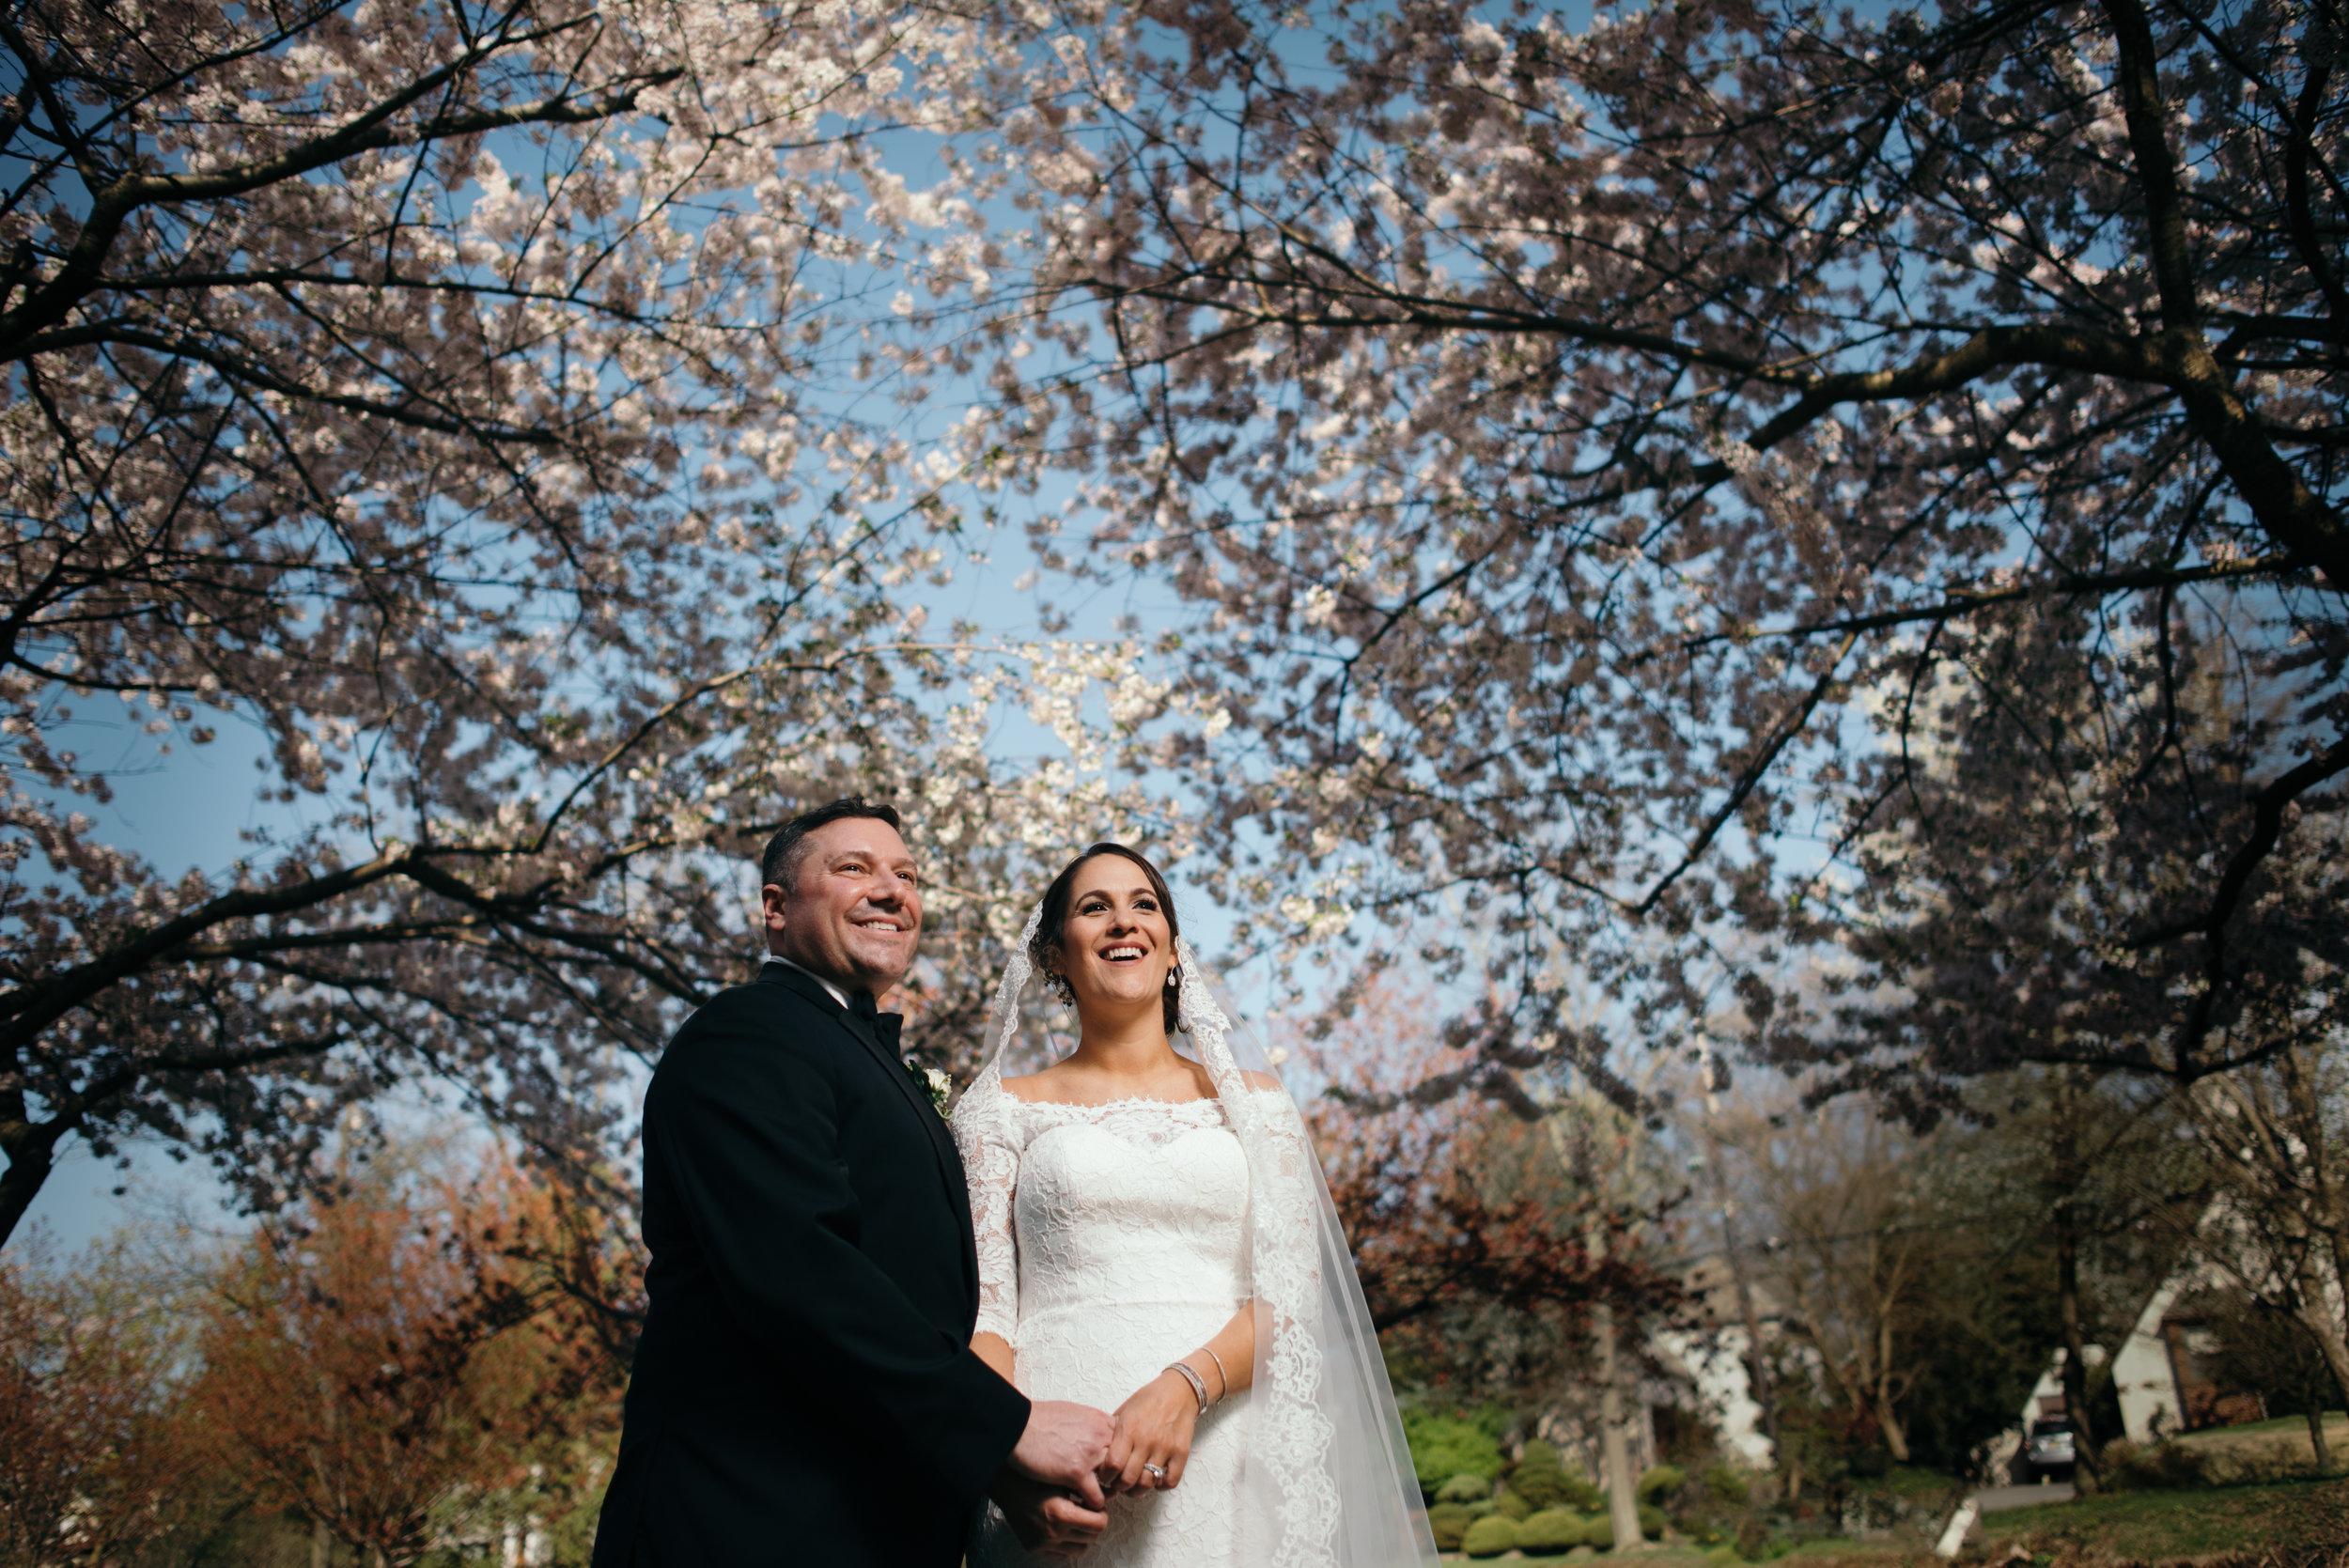 WeddingPhotos | NJPhotographer | Highlights-1-53.jpg